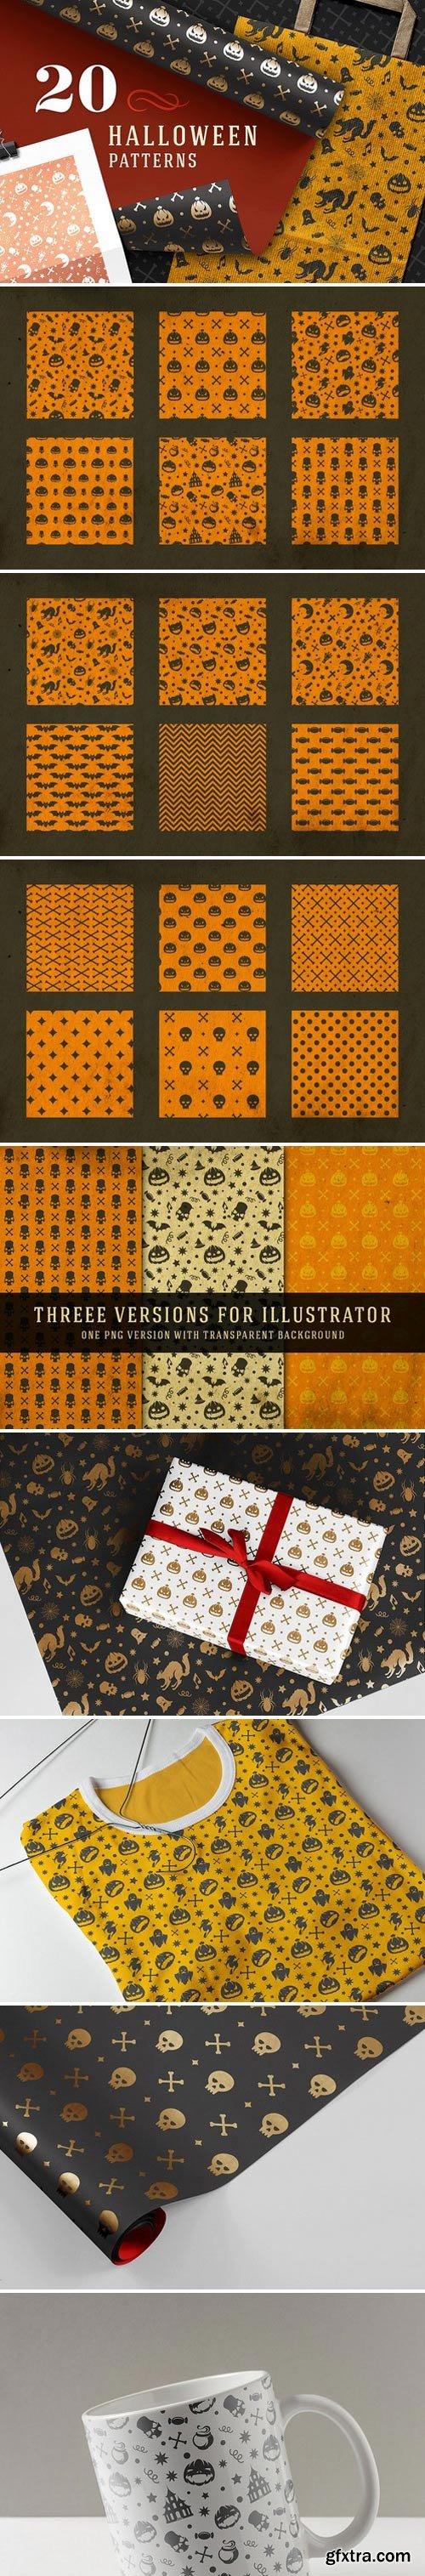 20 Halloween patterns